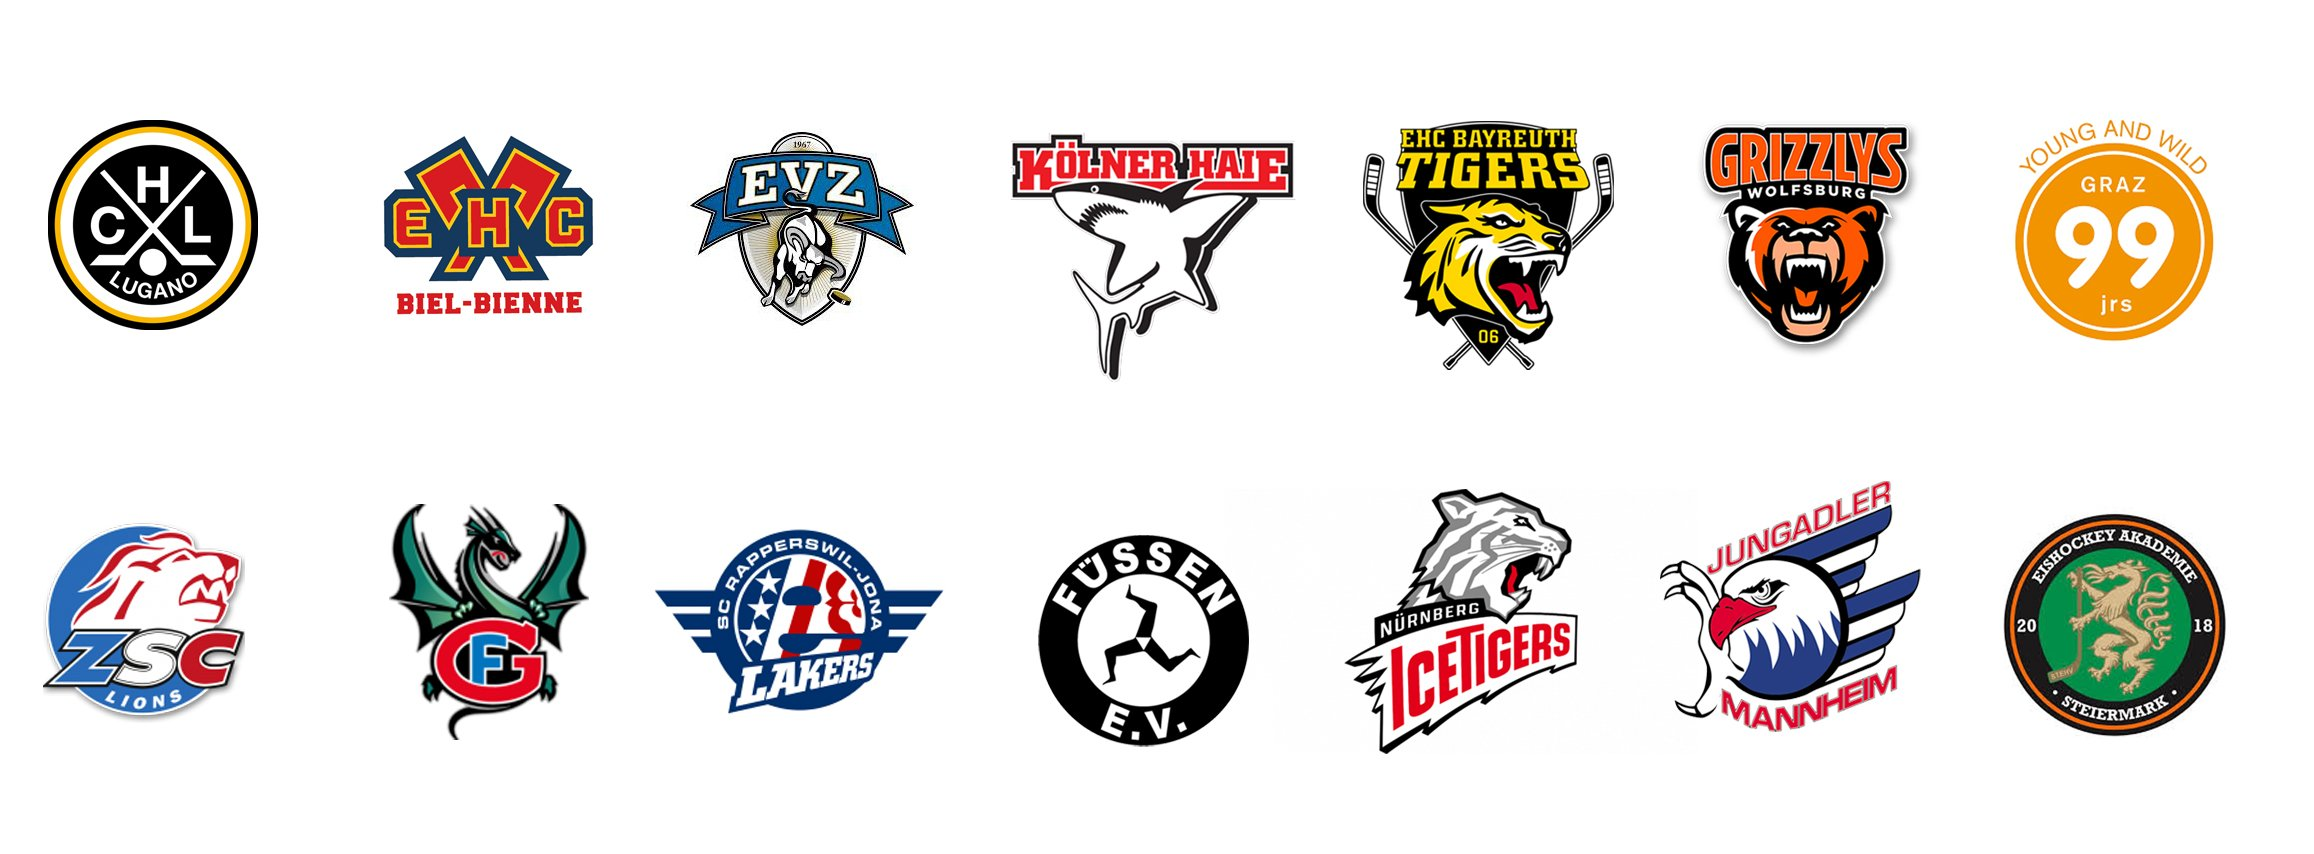 logos1_clubs-all